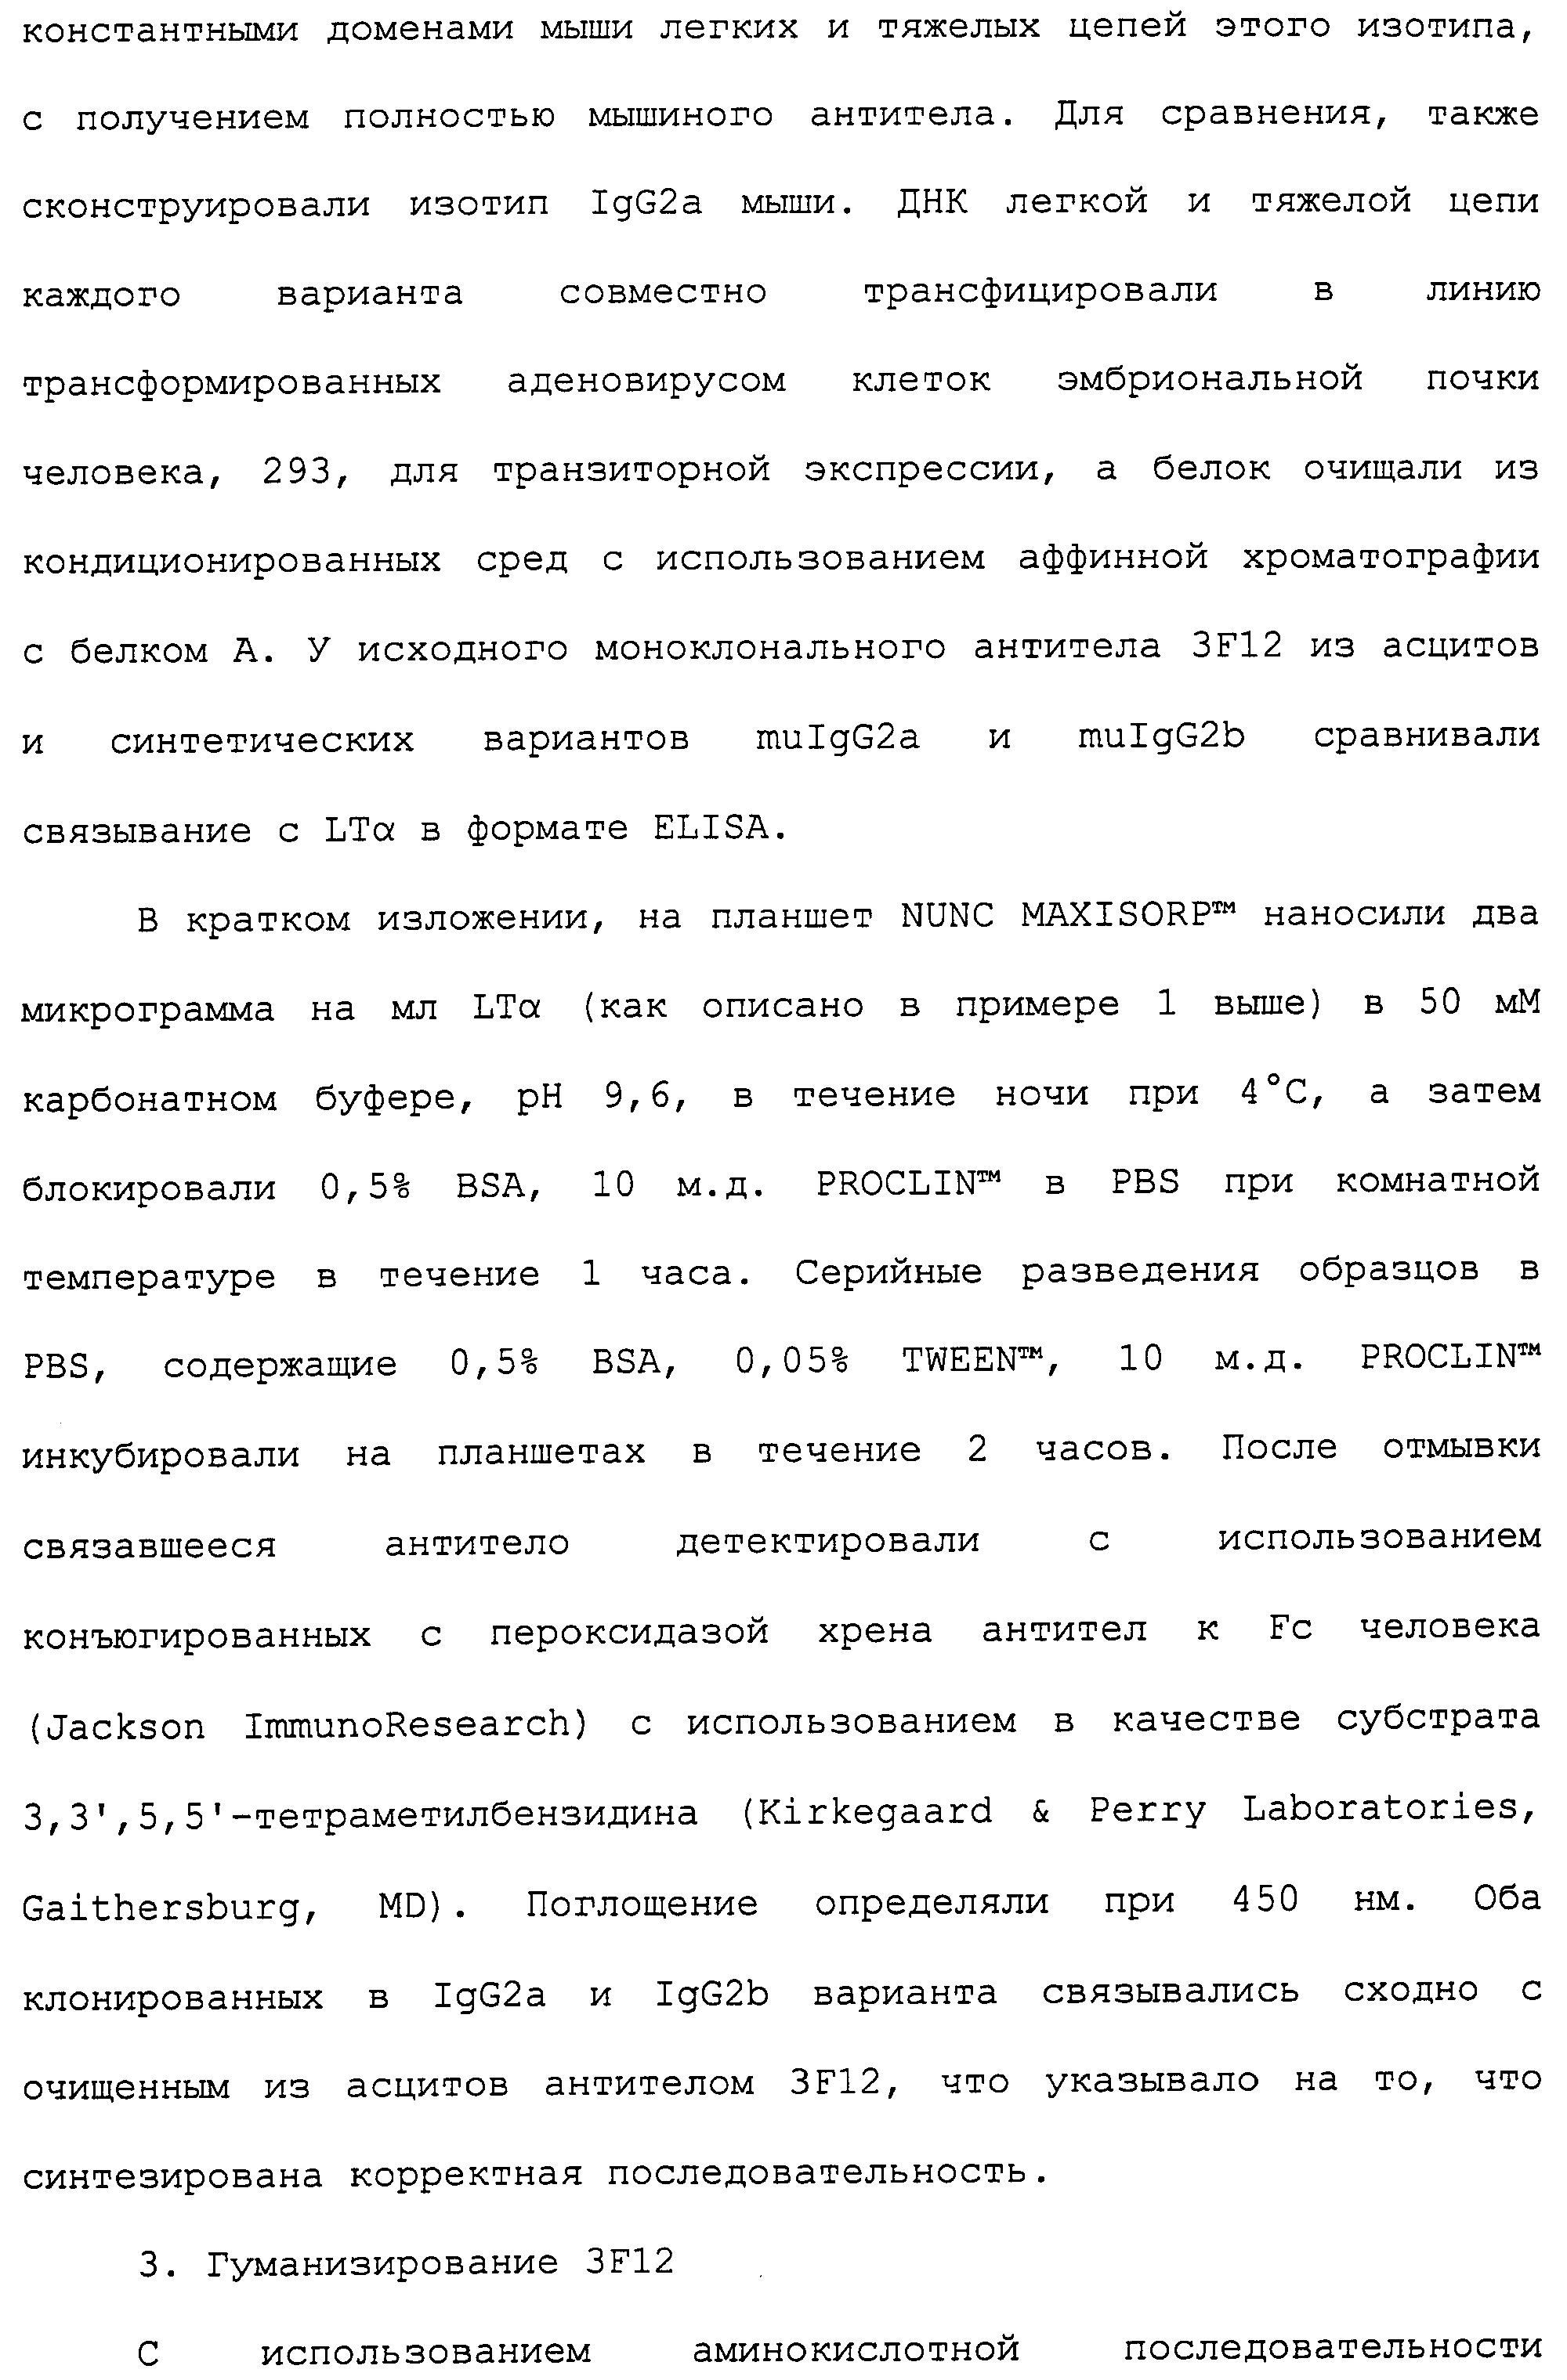 Figure 00000238